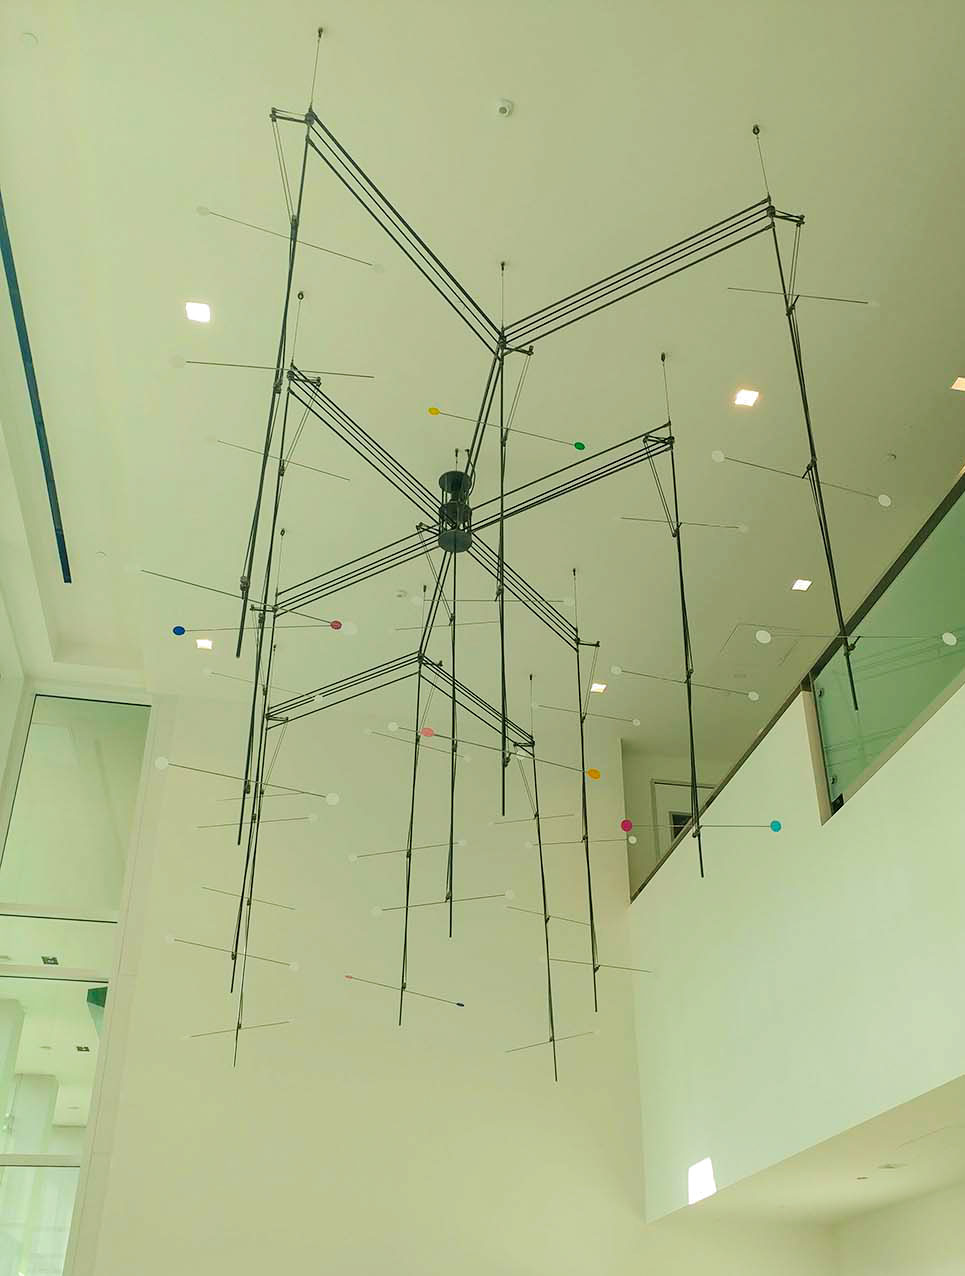 large lobby sculpture art in the Kaiser Permanente Ontario, CA medical center